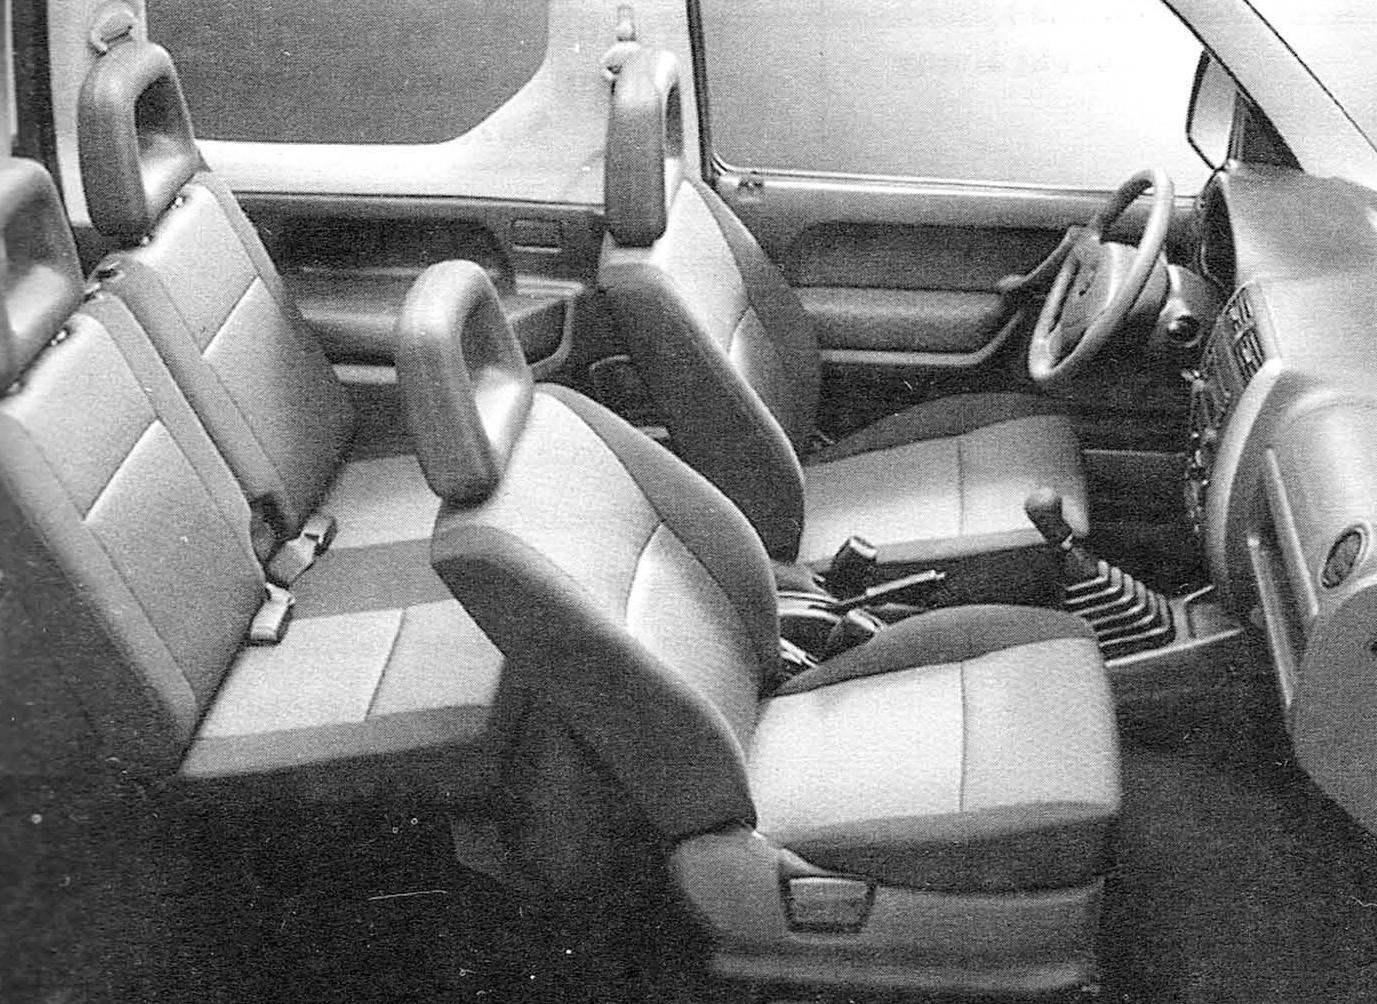 Salon Suzuki Jimny